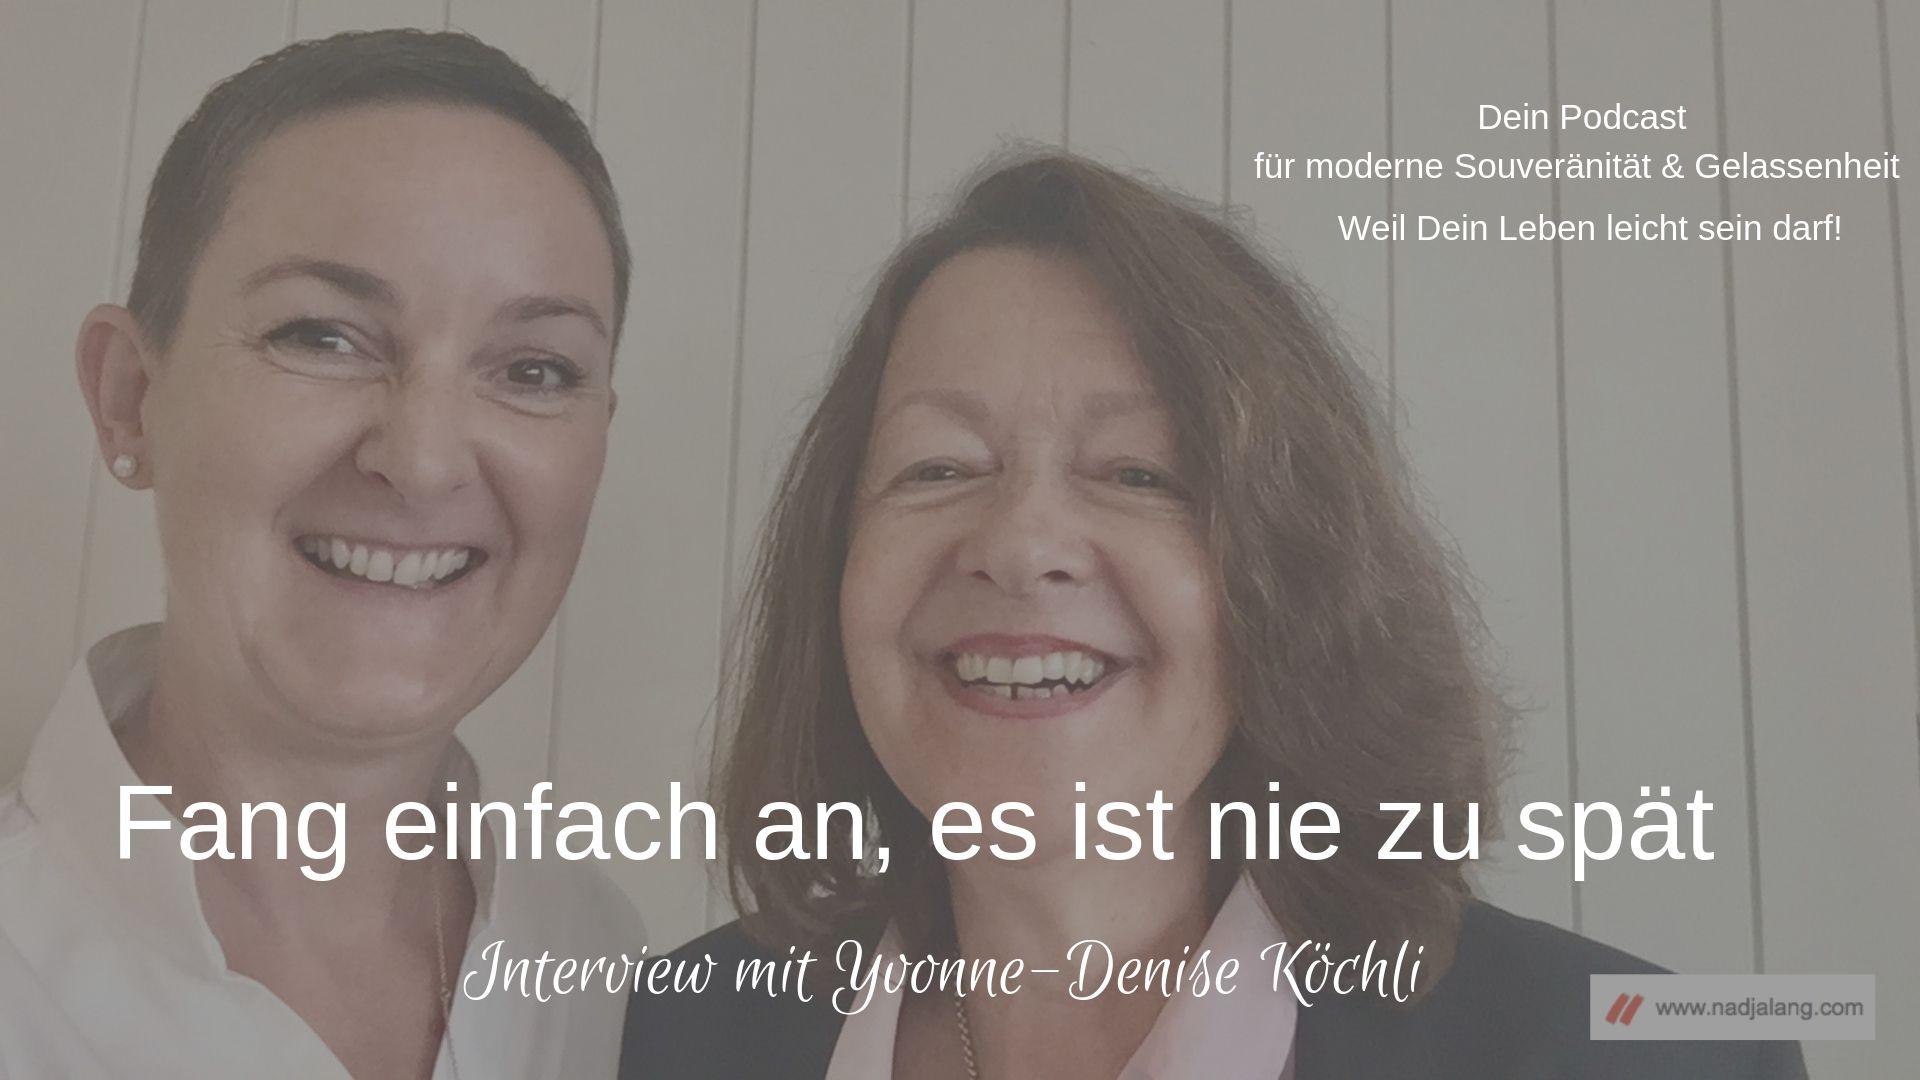 054 Bild Yvonne-Denise Köchli.jpg